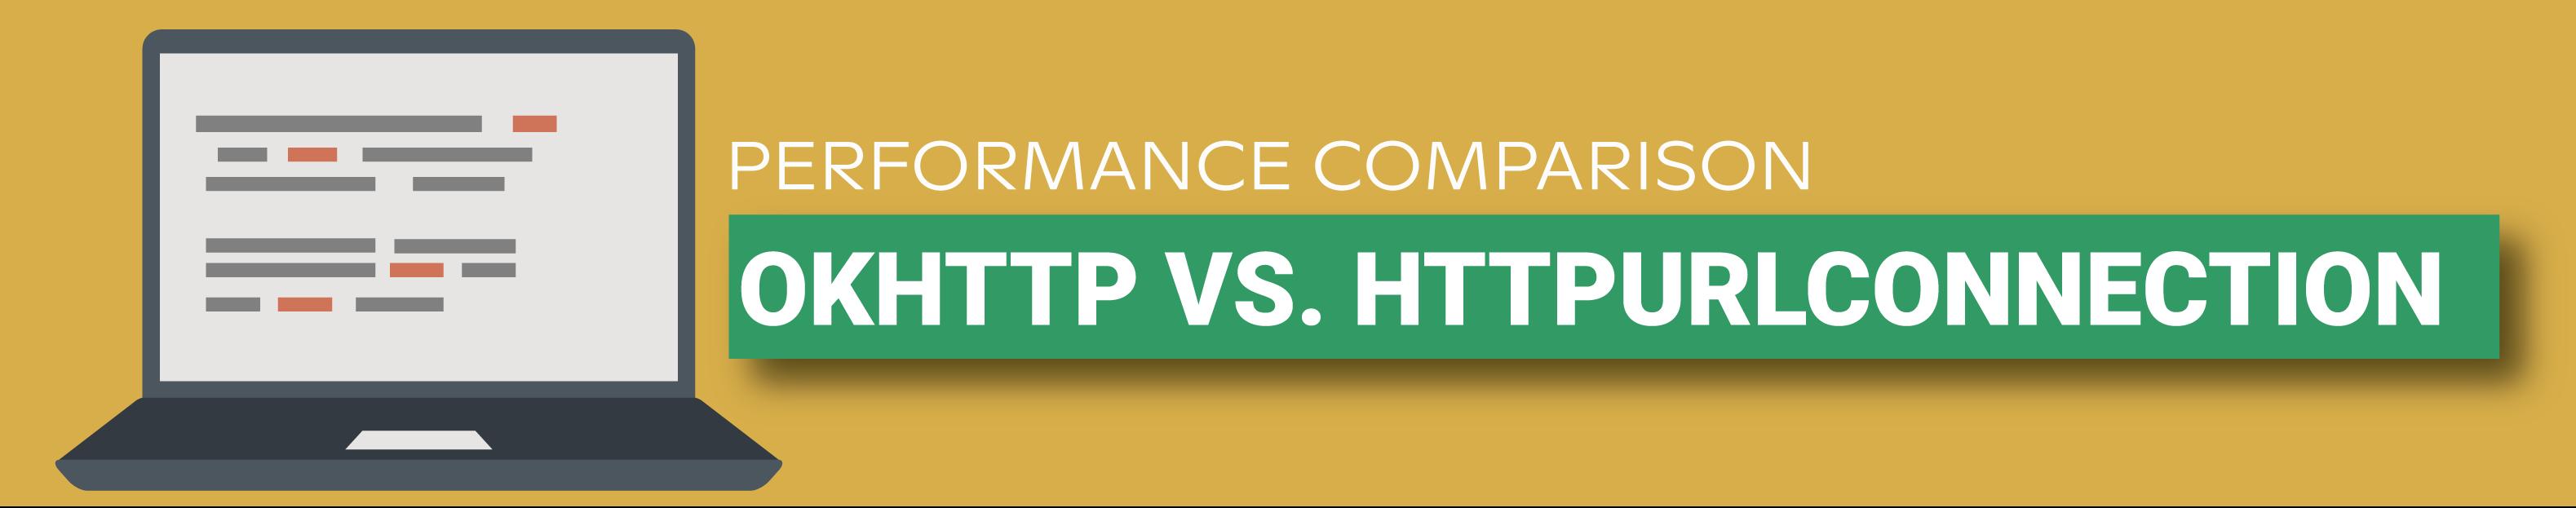 OKHttp vs. HttpURLConnection